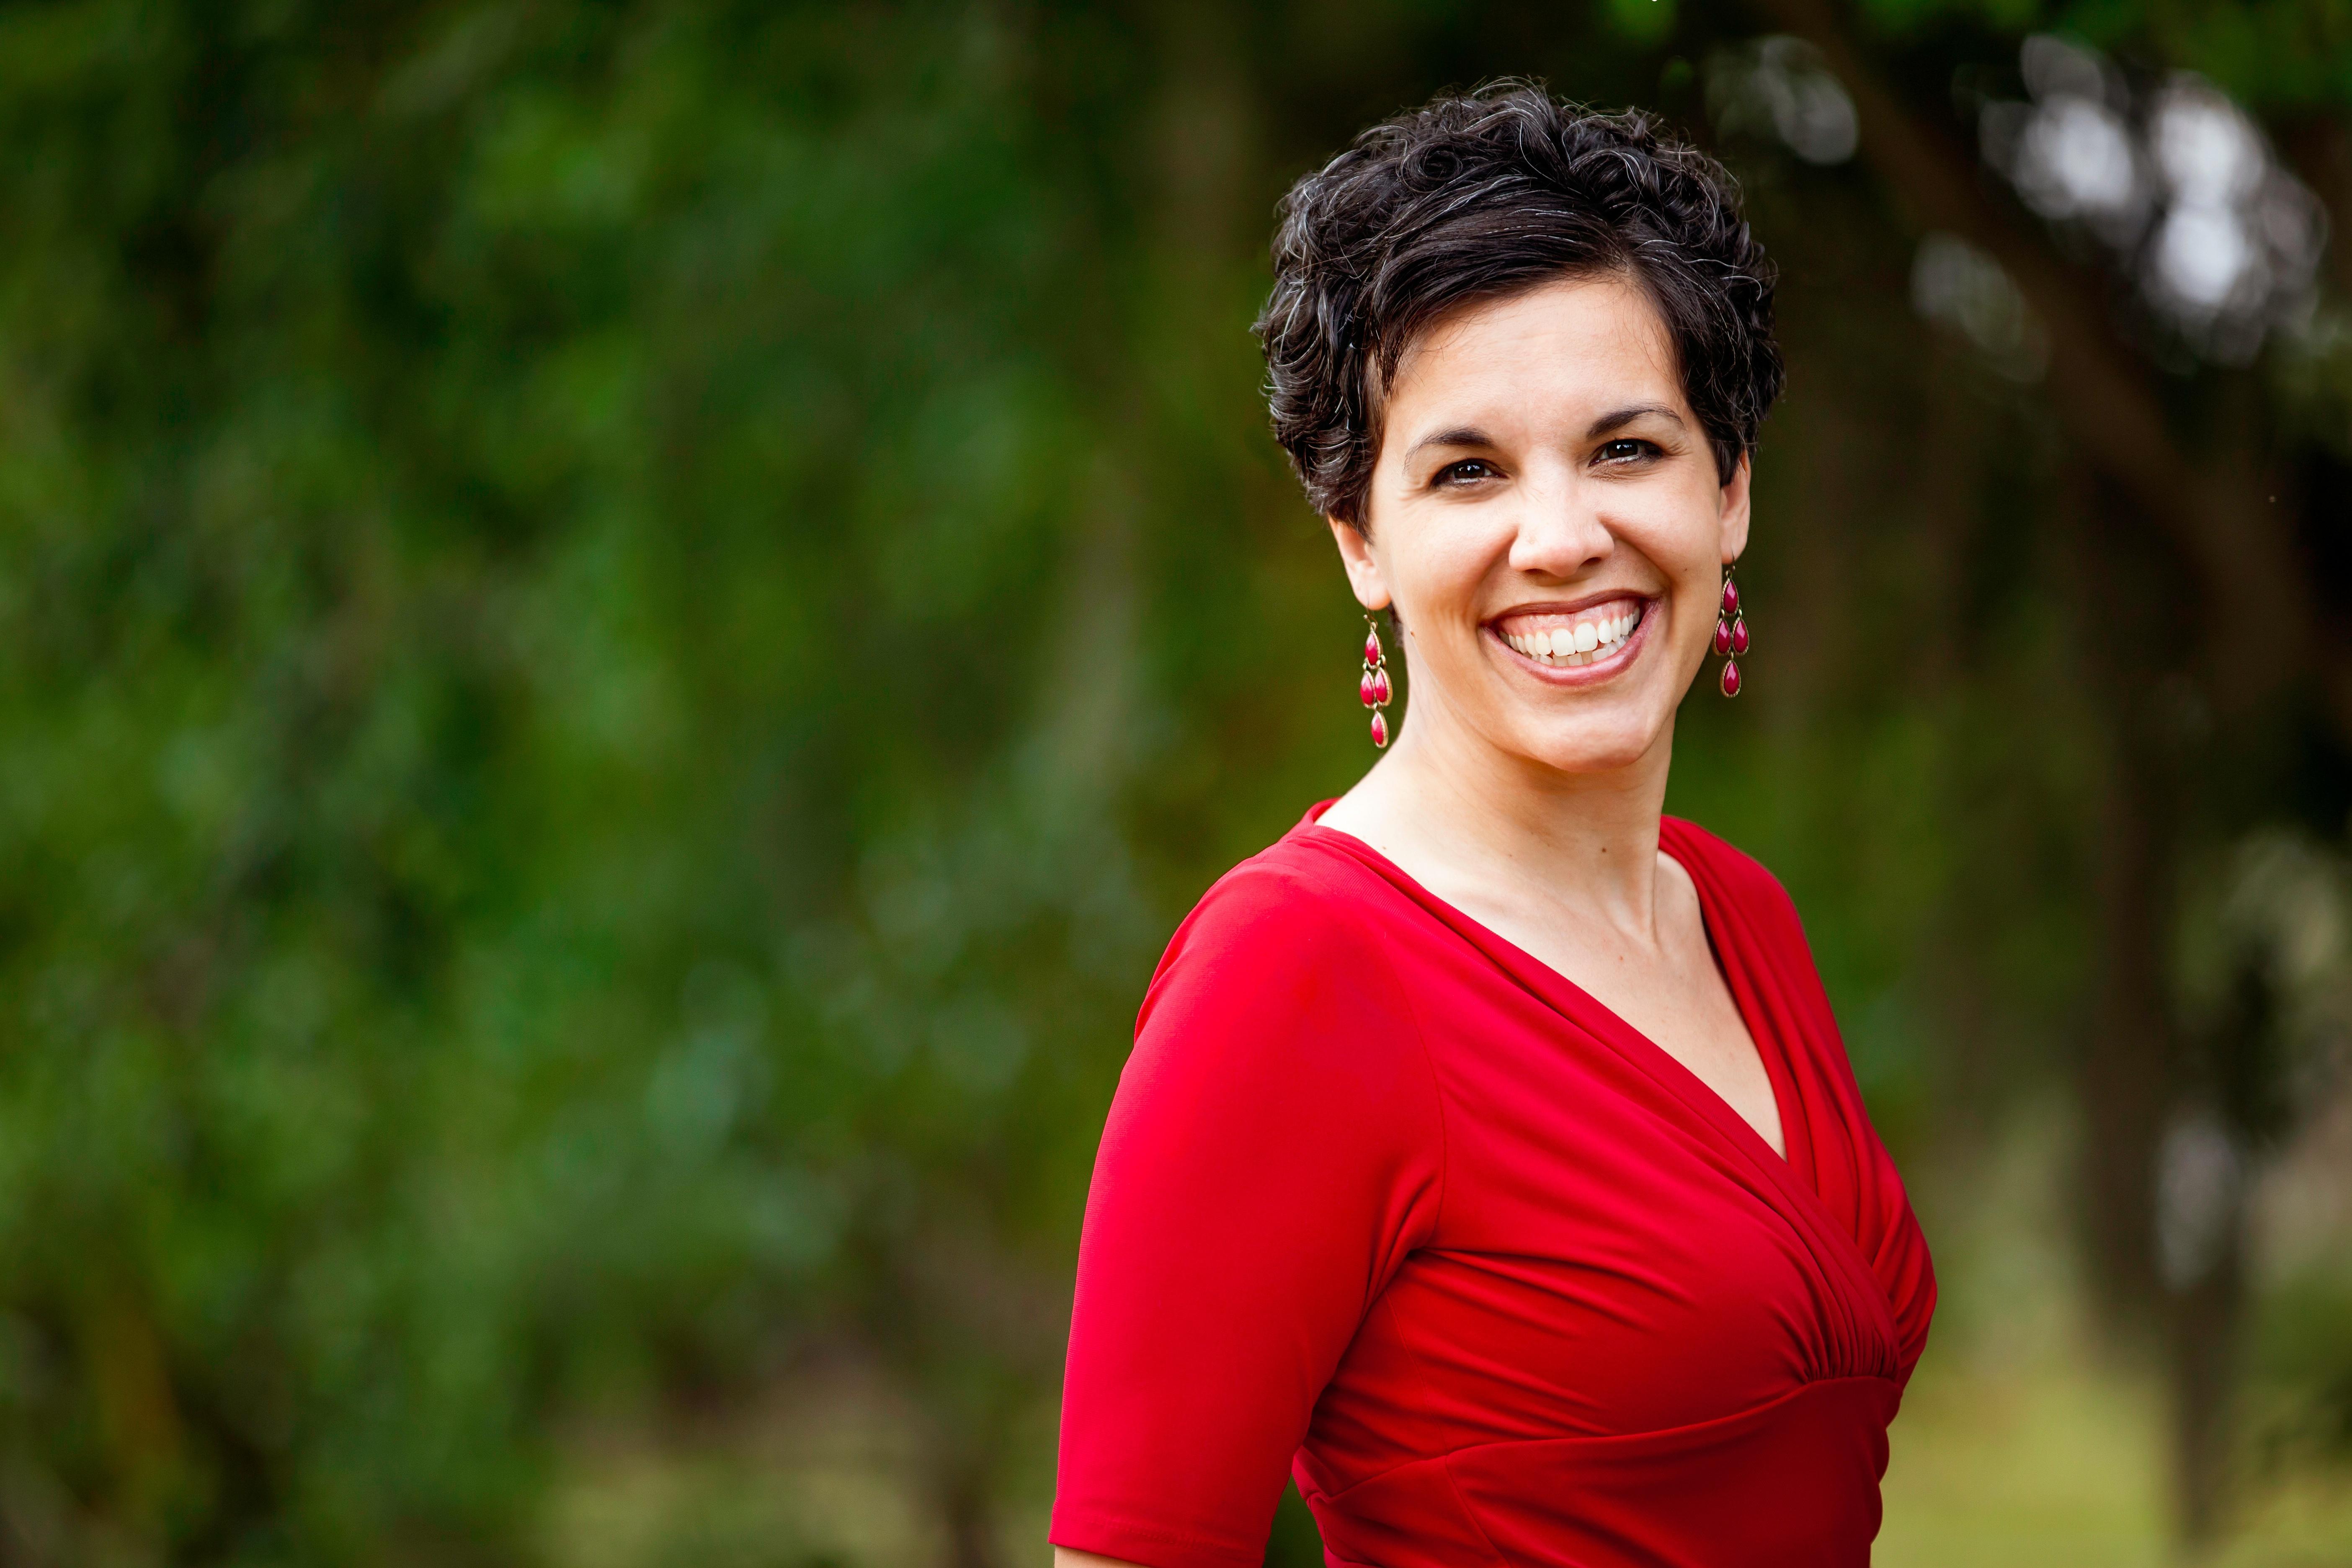 Ruth-Buchanan-Verblio-freelance-writer